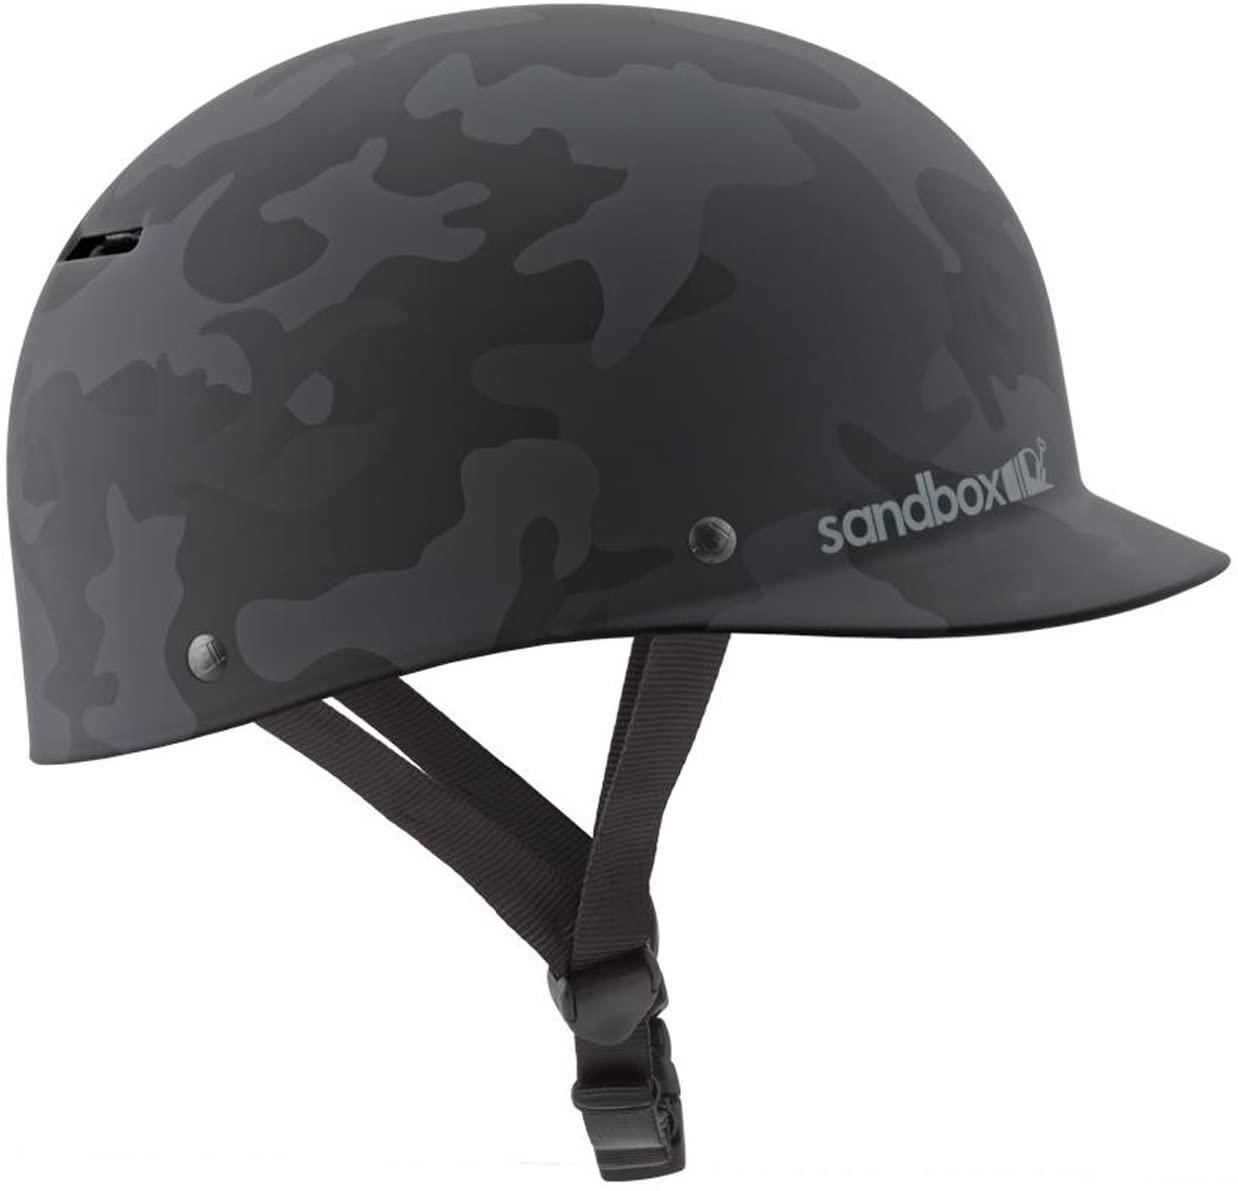 SANDBOX Classic 2.0 Low Rider Wake Helmet (Matte Black Camo, Large)